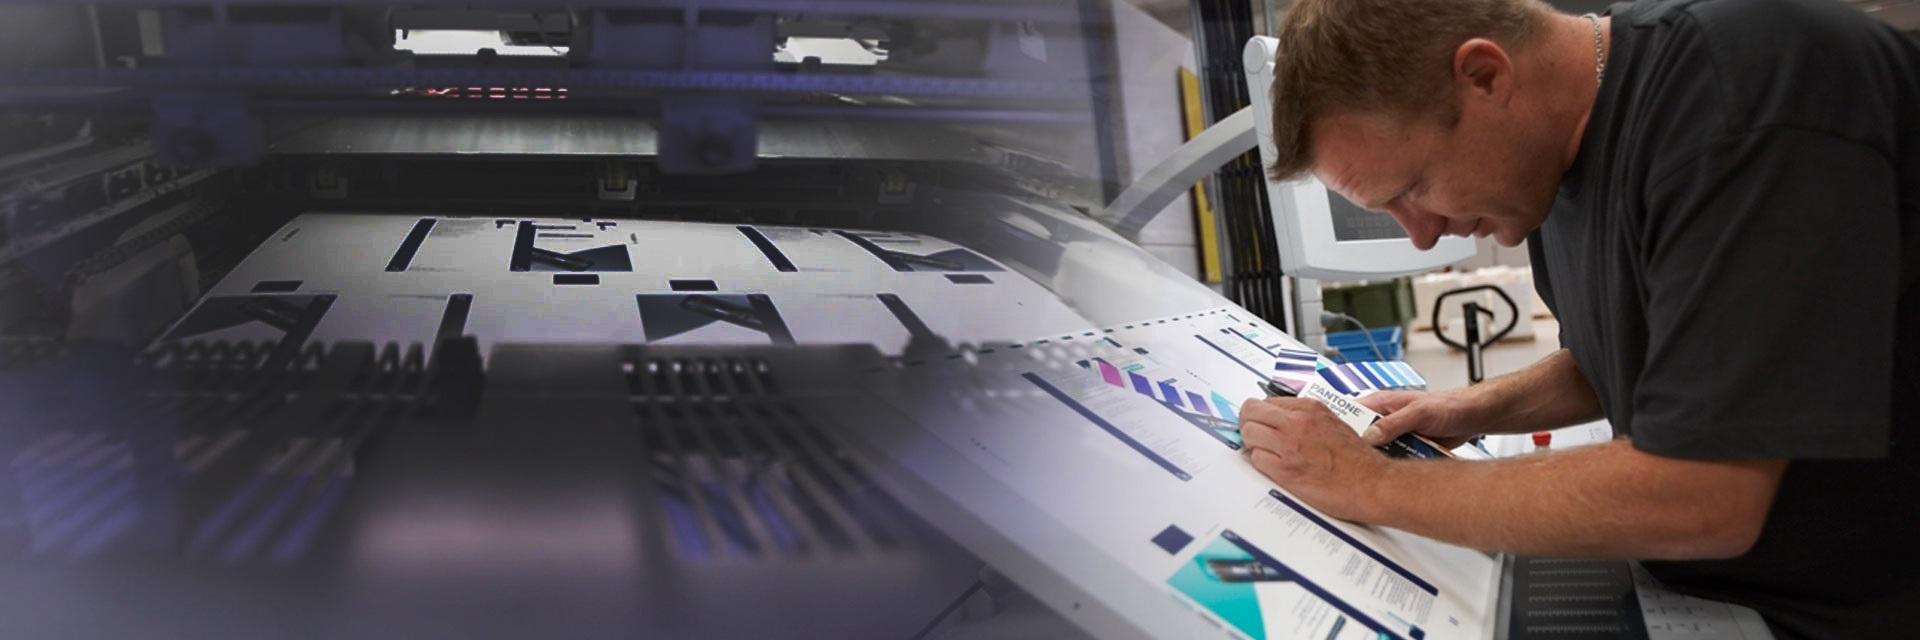 3-1-print-solutions-com.jpg